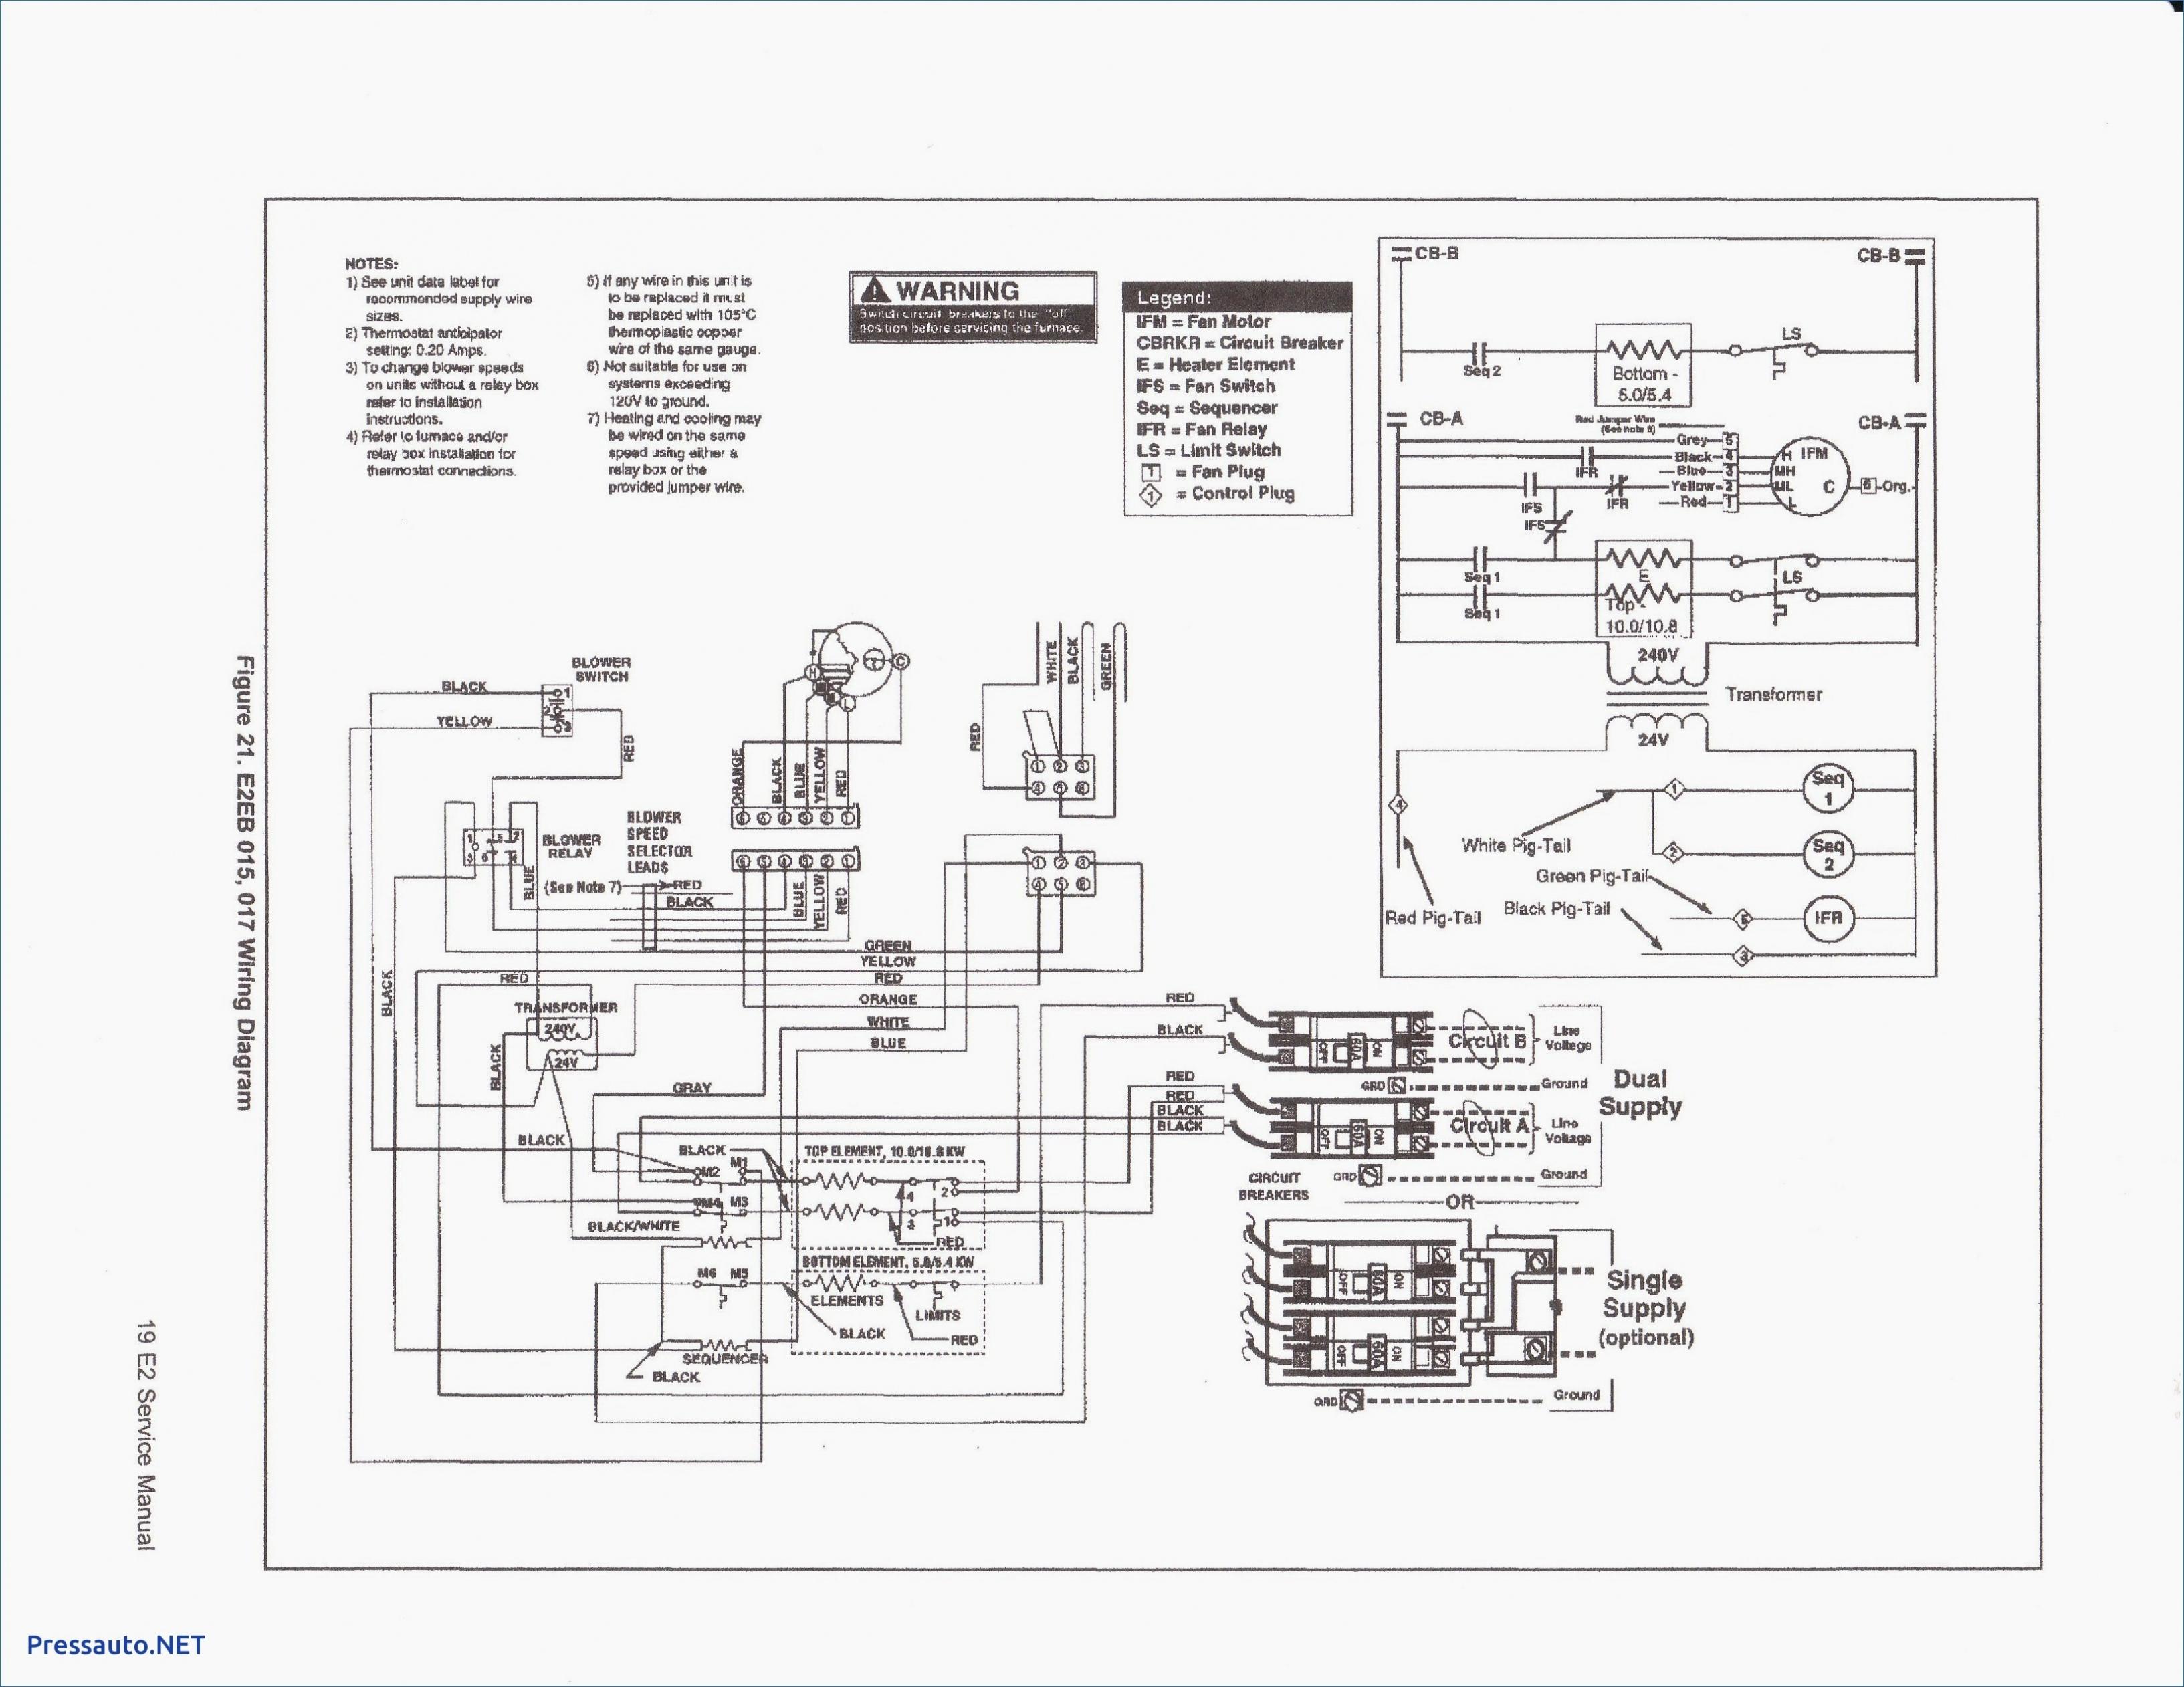 Goodman Air Handler Wiring Diagram For Ar61 1 | Wiring Diagram - Goodman Air Handler Wiring Diagram